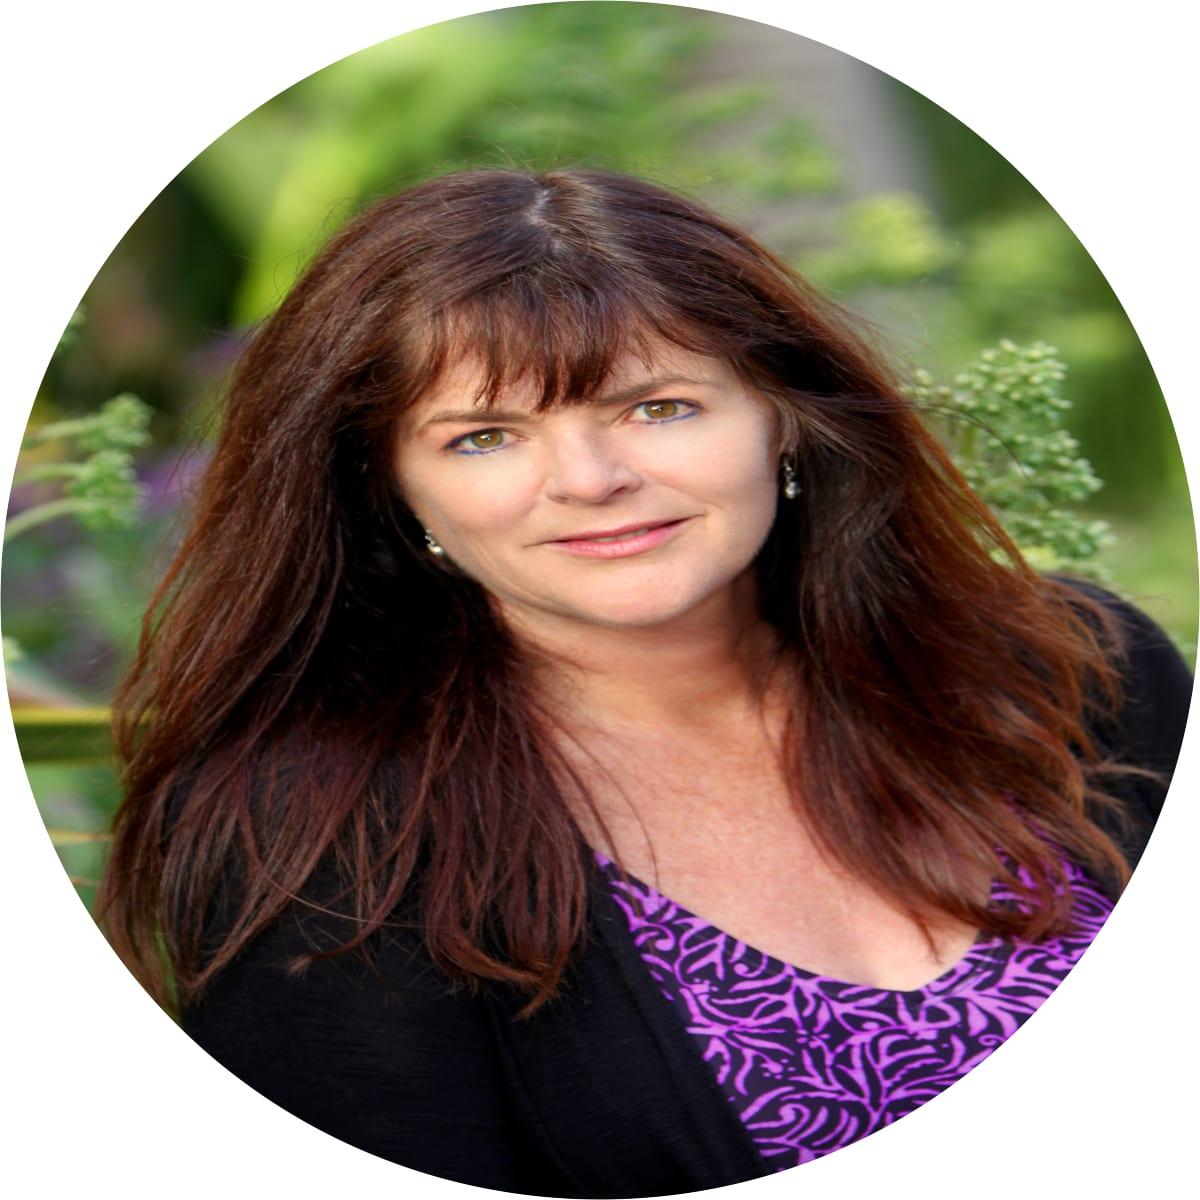 Discussion on this topic: Sarah Glendening, elaine-miles/